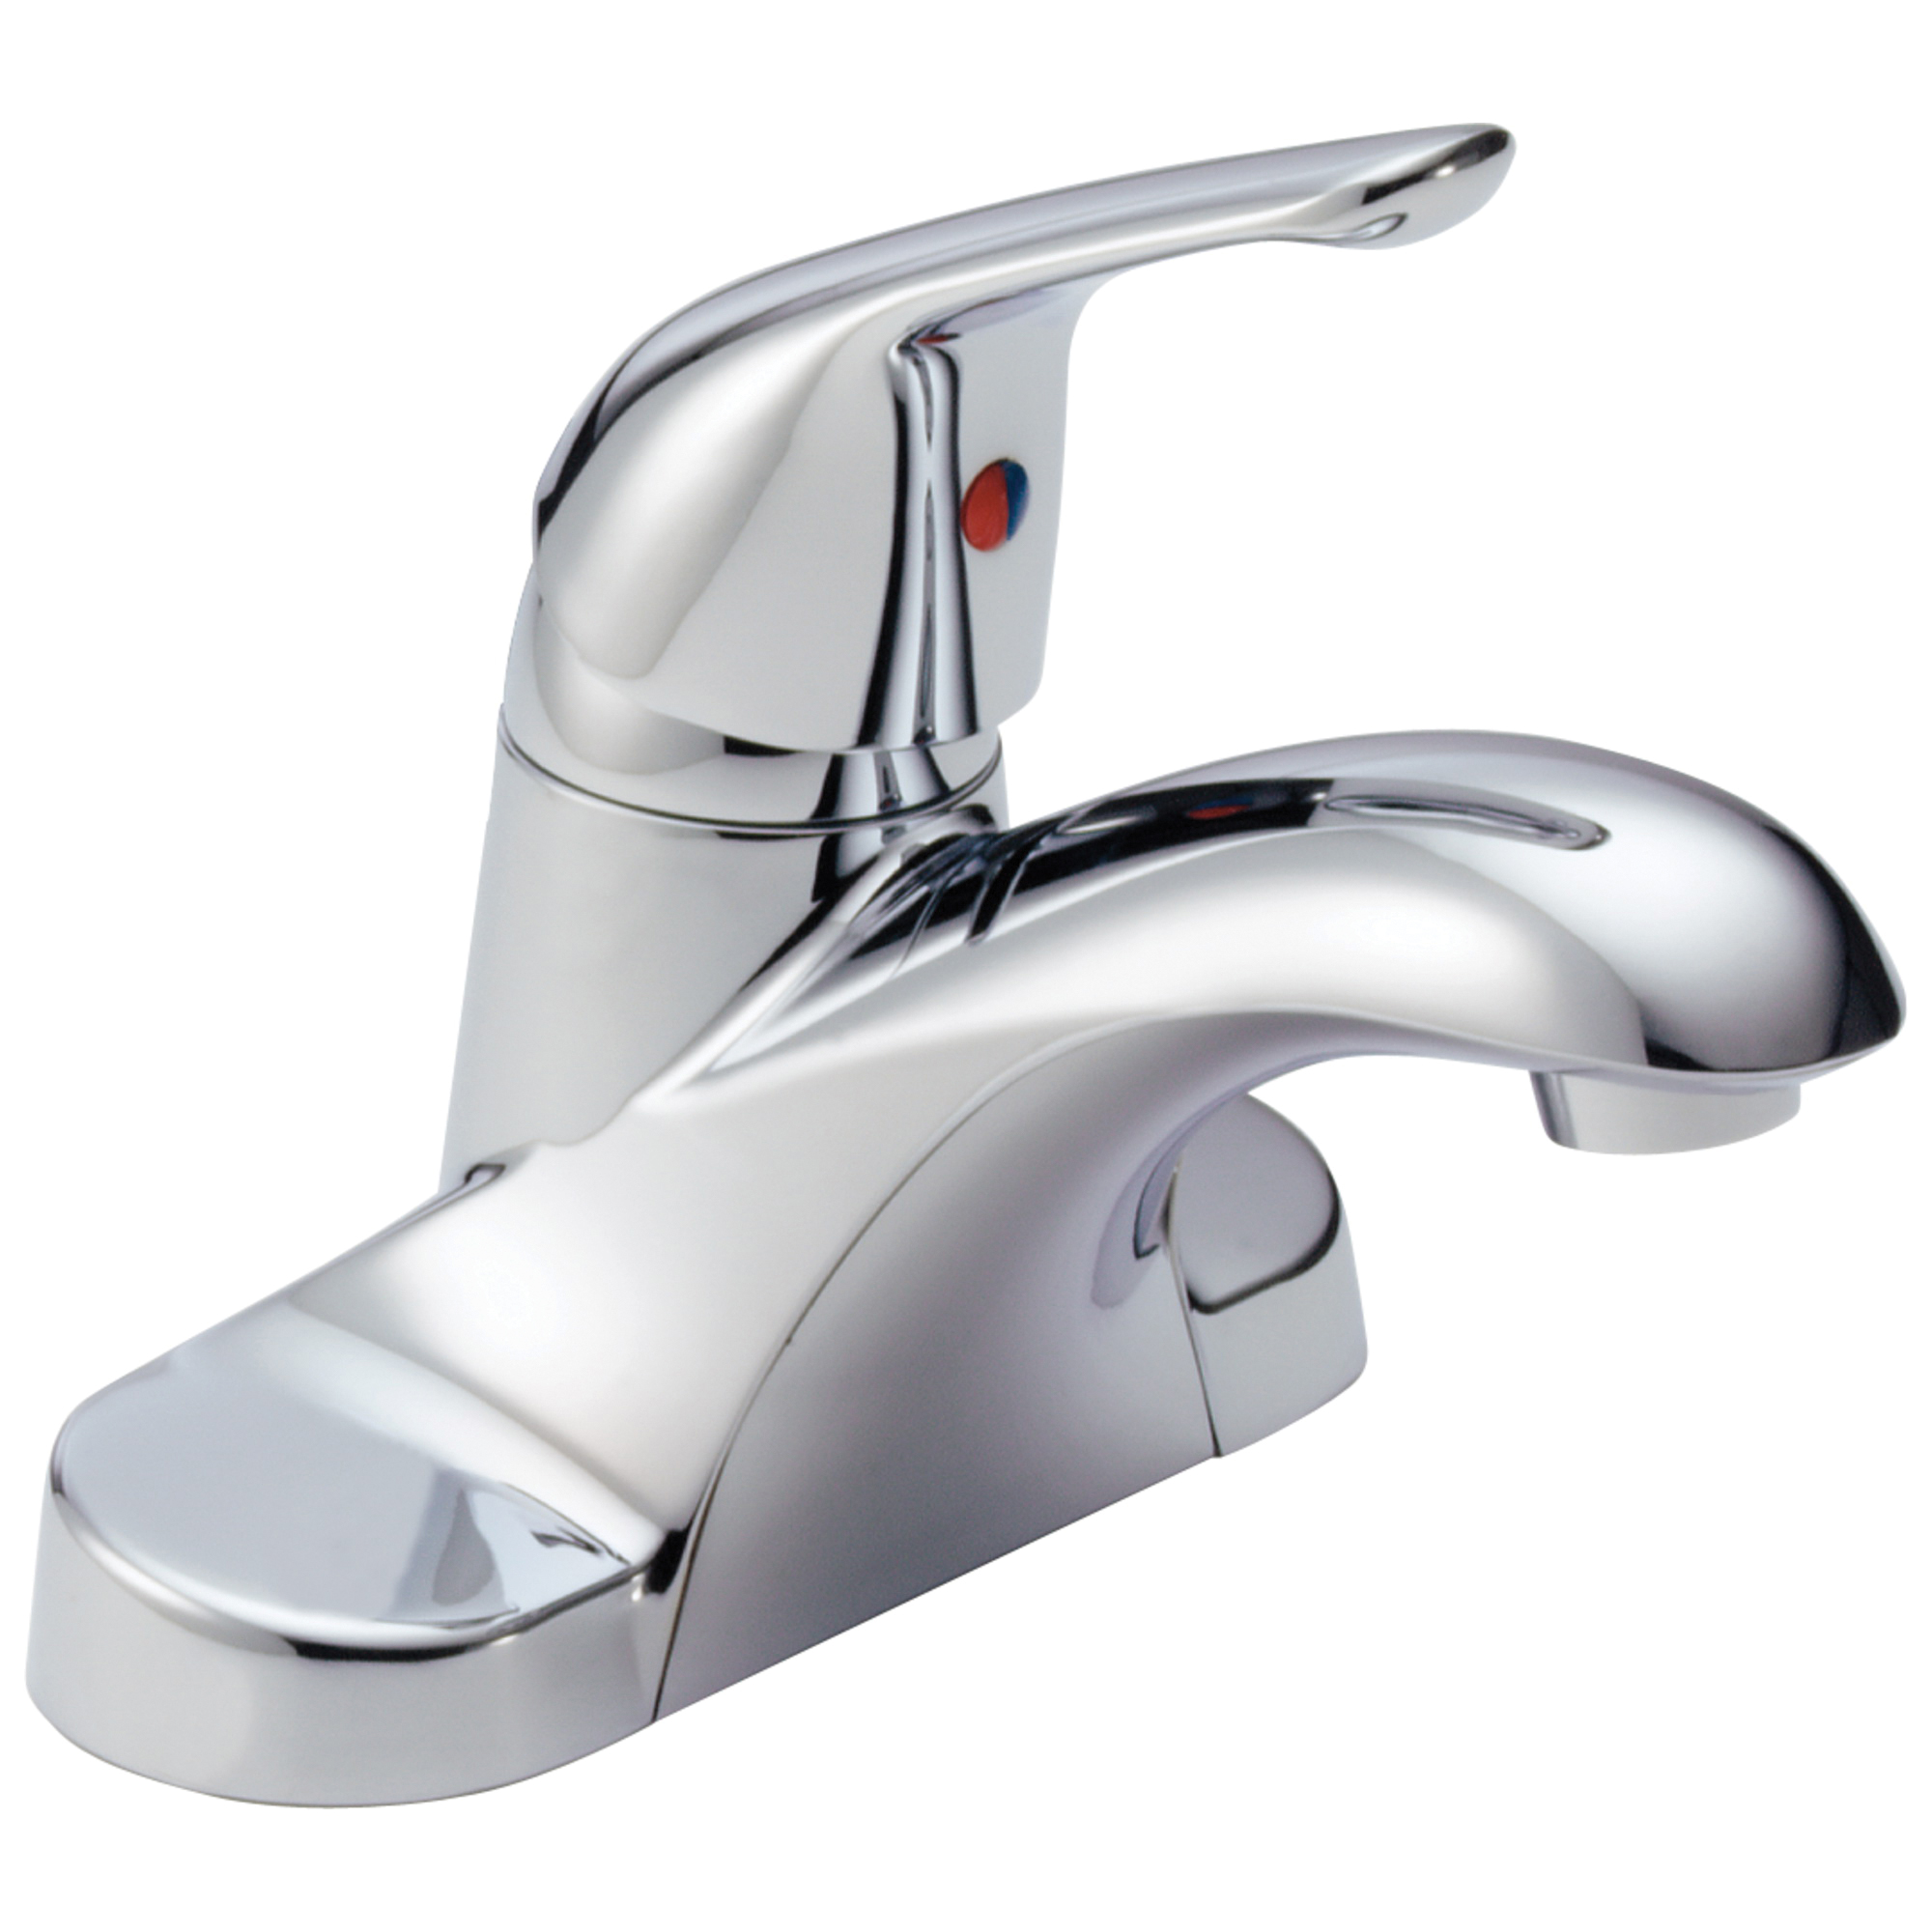 DELTA® B501LF-LH Centerset Lavatory Faucet, Foundations®, Chrome Plated, 1 Handles, 1.2 gpm